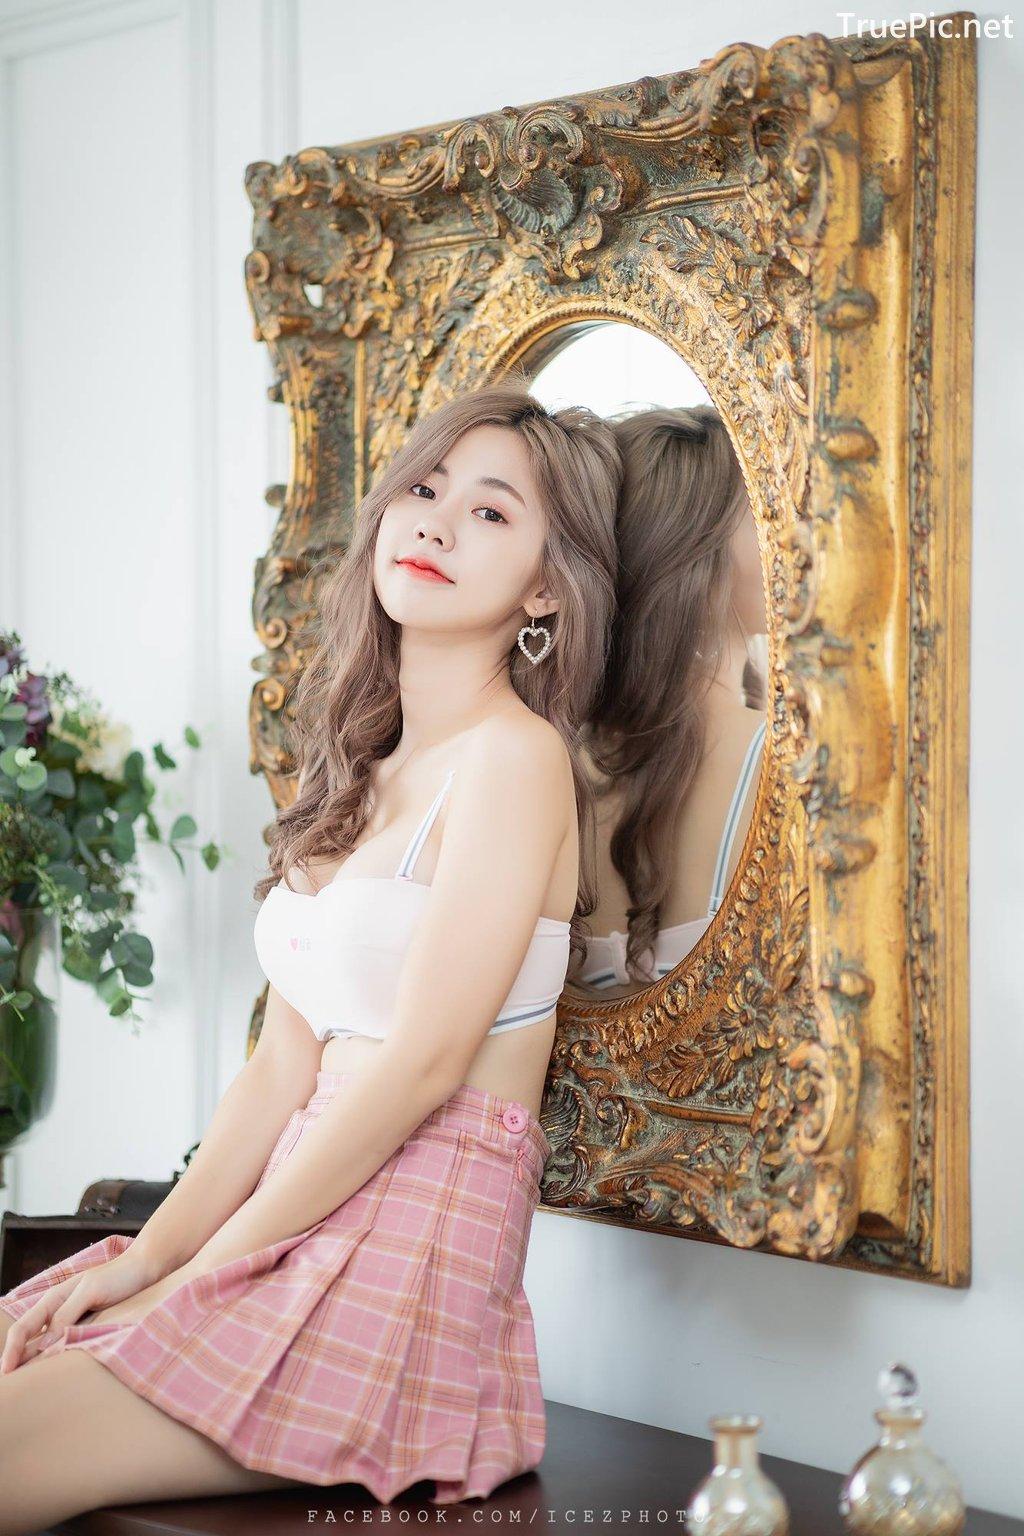 Image-Thailand-Hot-Girl-Nilawan-Iamchuasawad-So-Beautiful-With-White-Bra-and-Miniskirt-TruePic.net- Picture-2